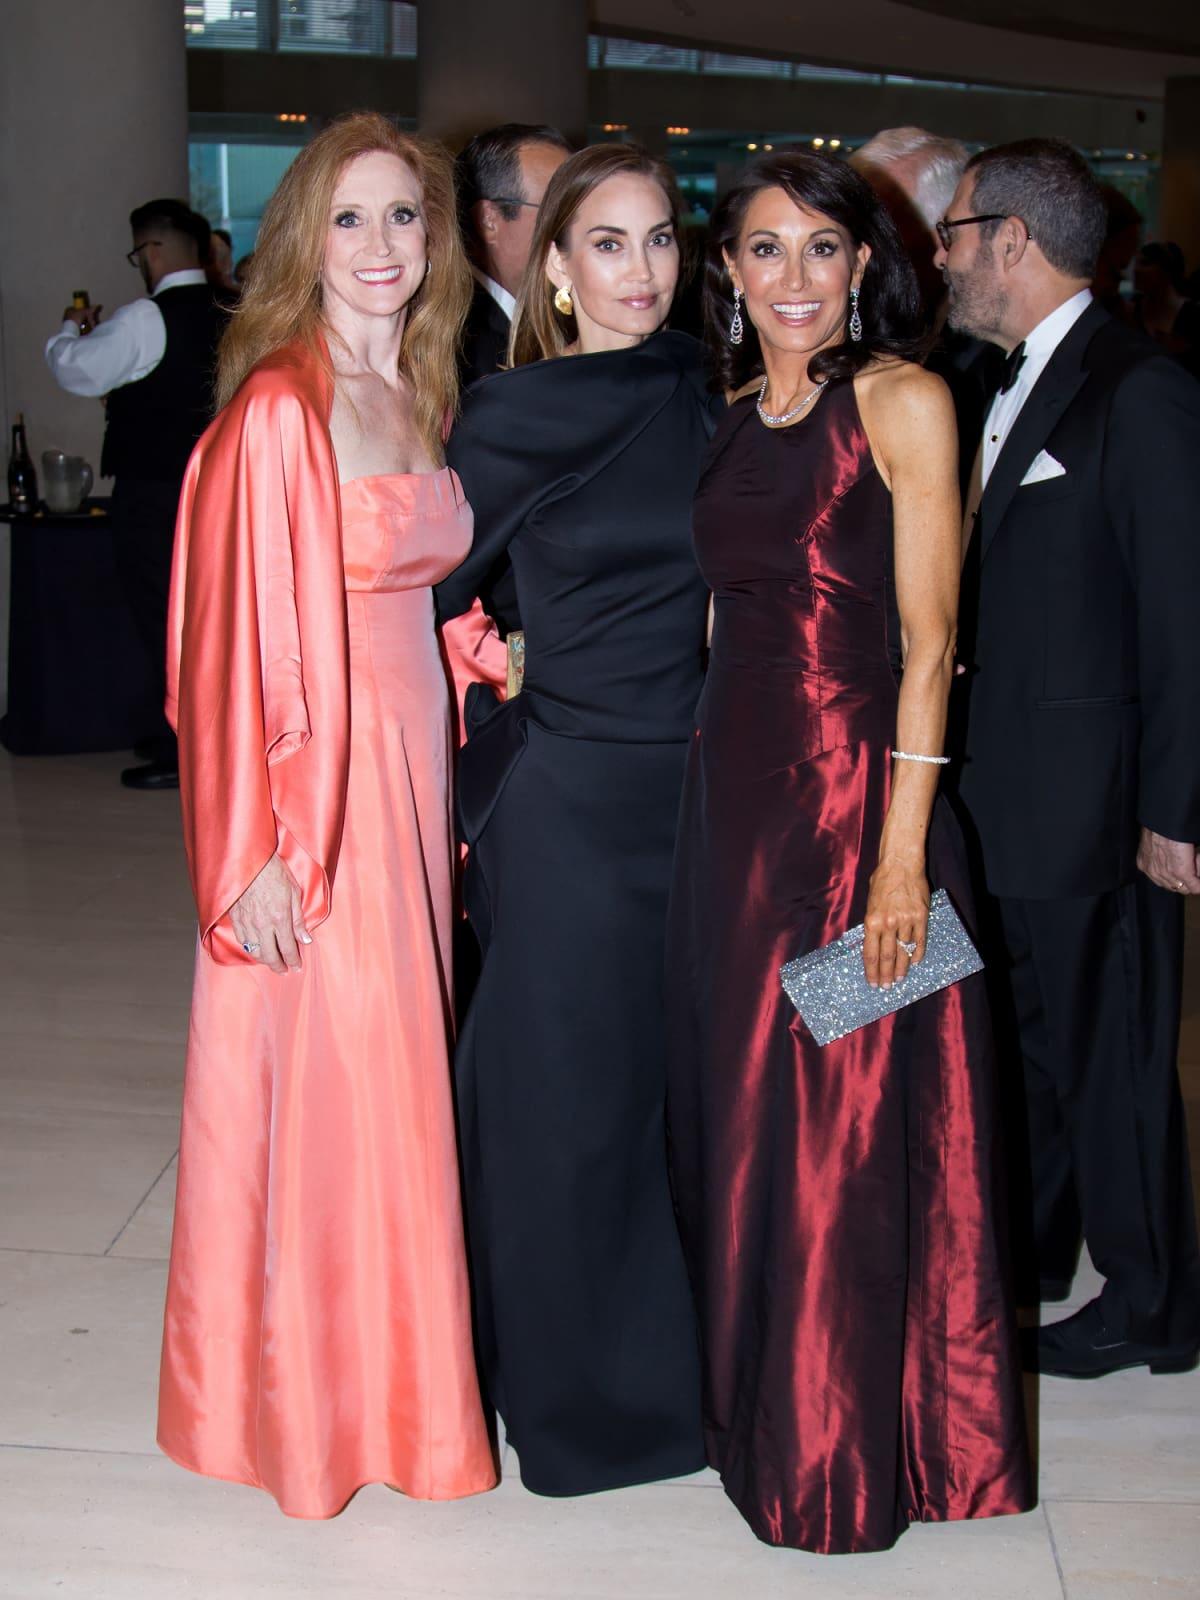 Tiffany Divis, Kara Goss, Rhonda Marcus